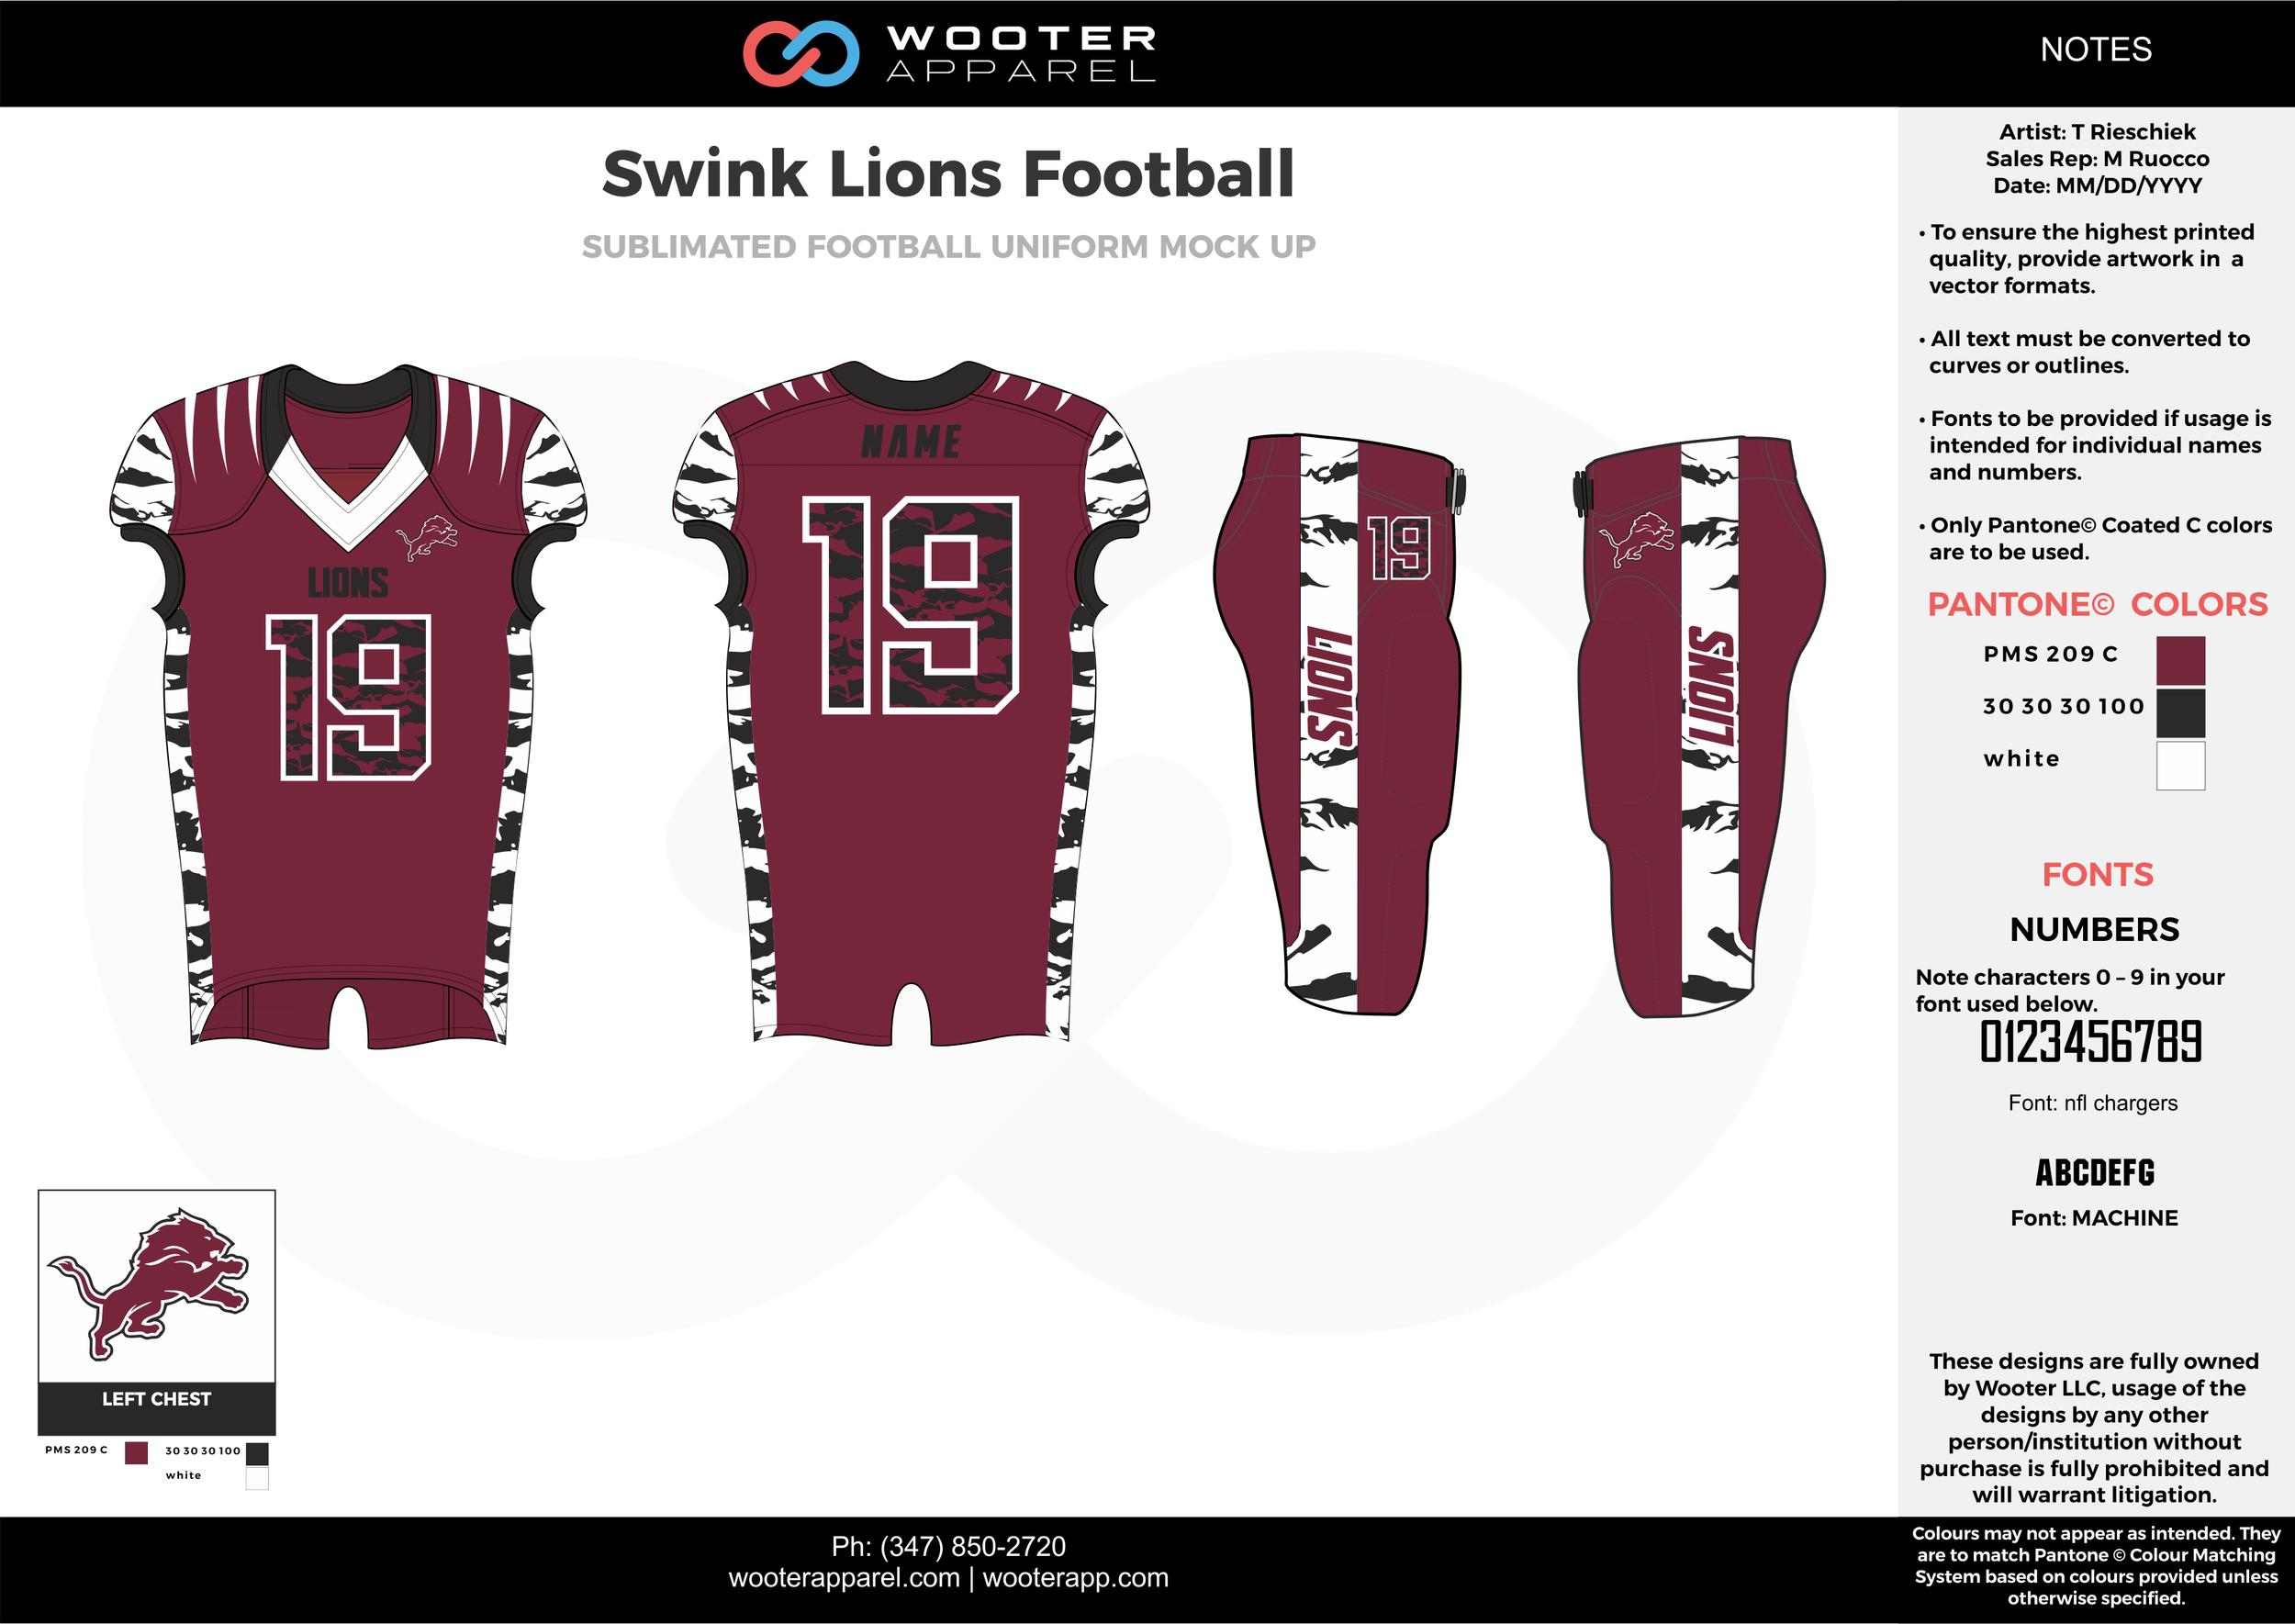 Swink Lions Football maroon white black football uniforms jerseys pants